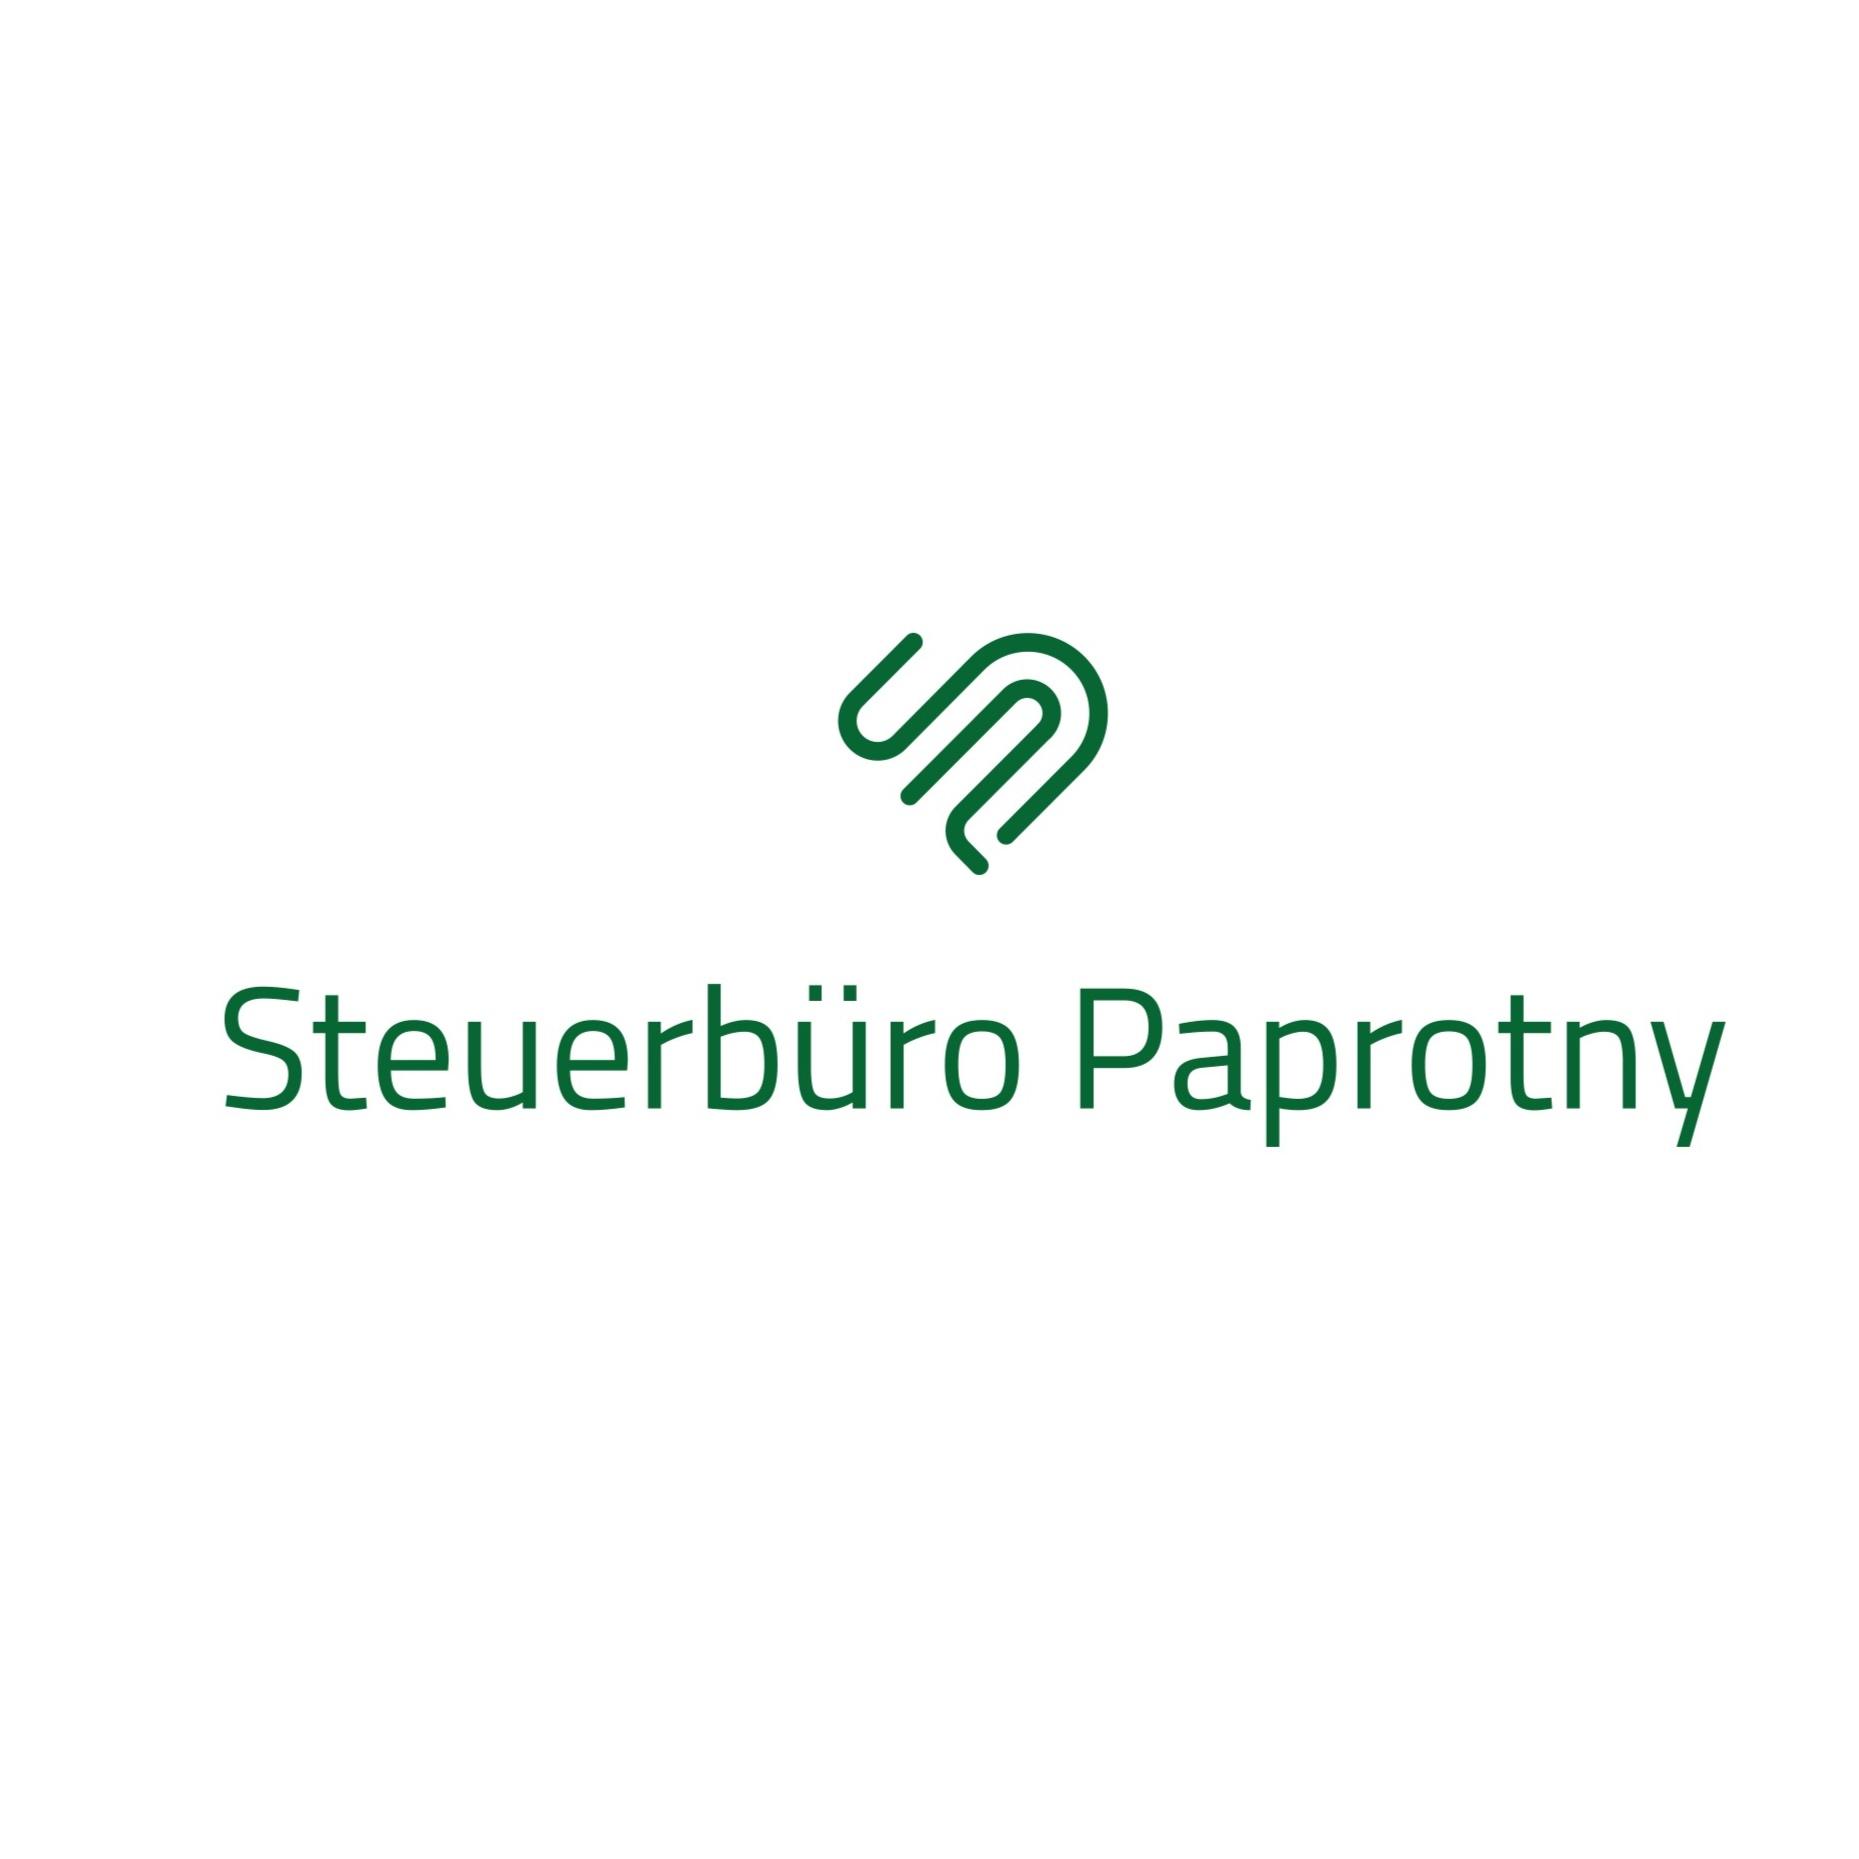 Steuerbüro Paprotny Bonn-Beuel